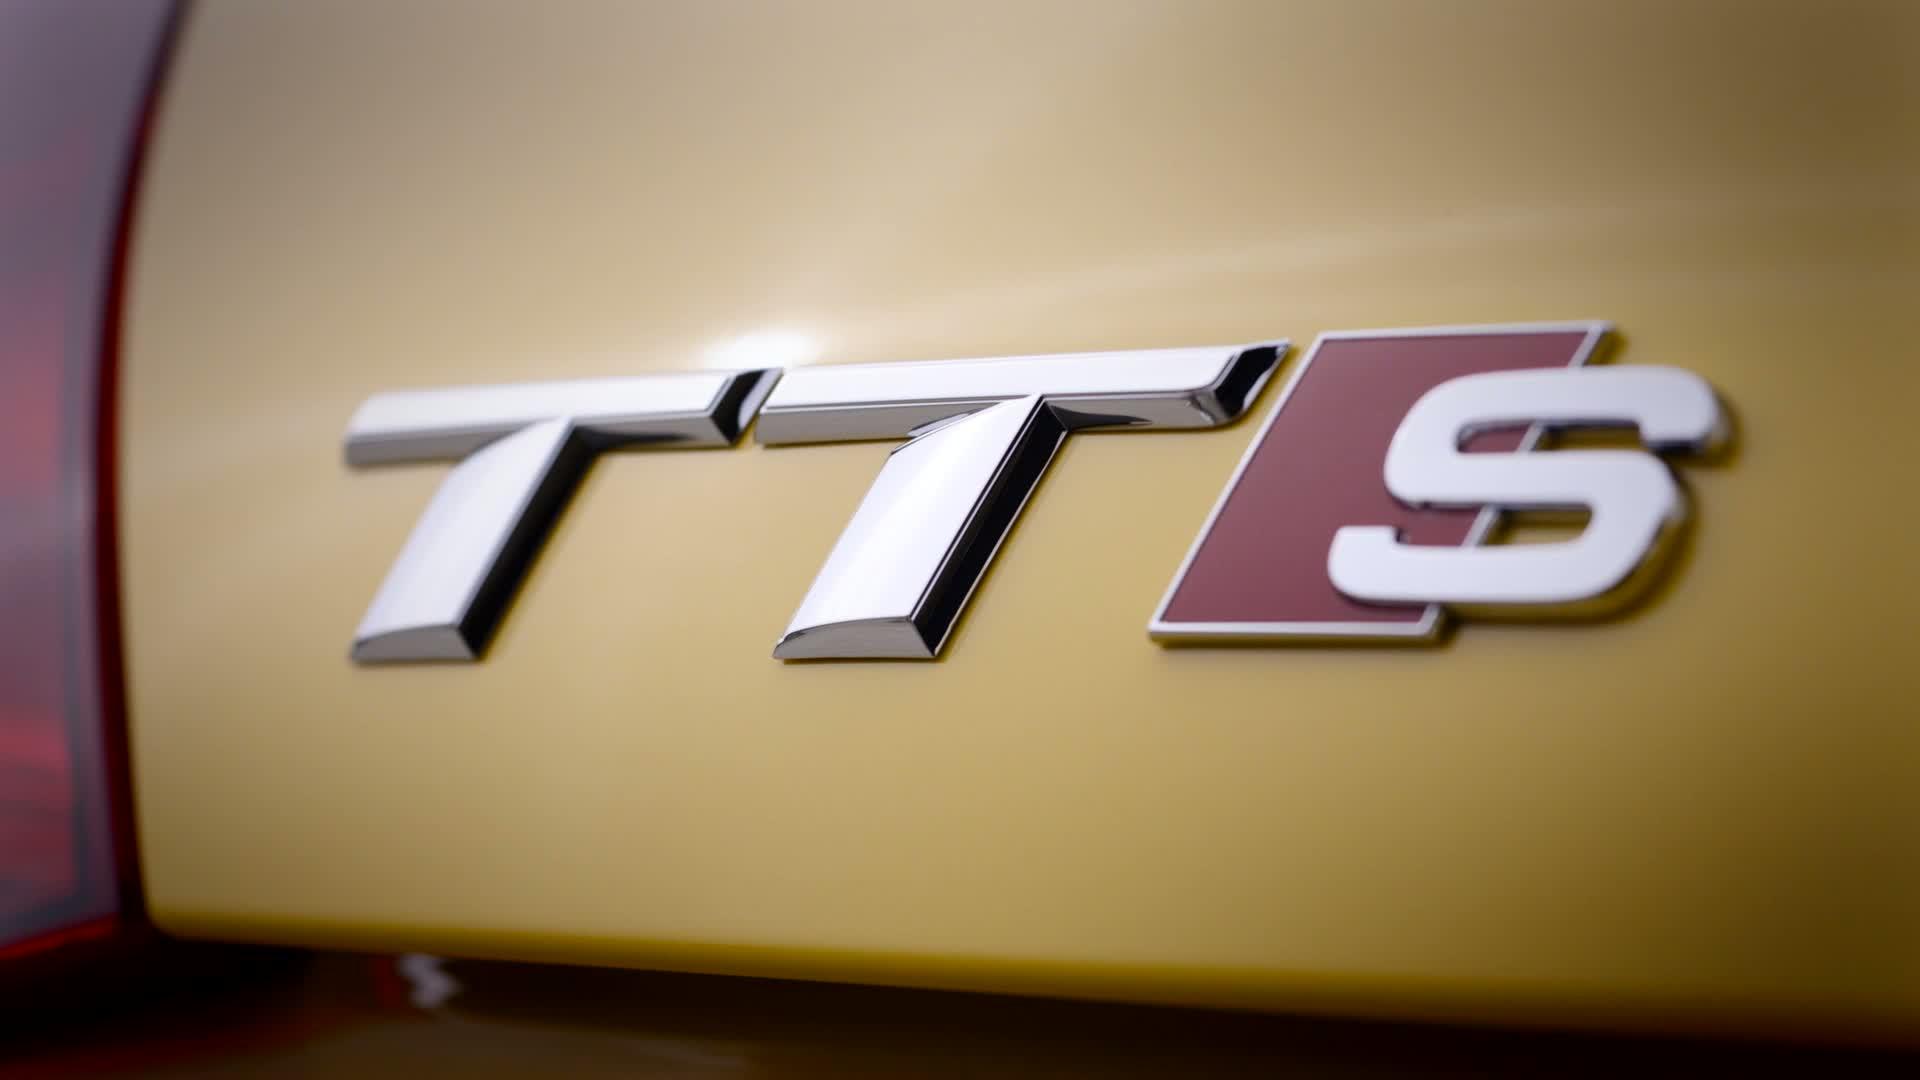 Exklusiver Fahrbericht: Der neue Audi TTS Roadster